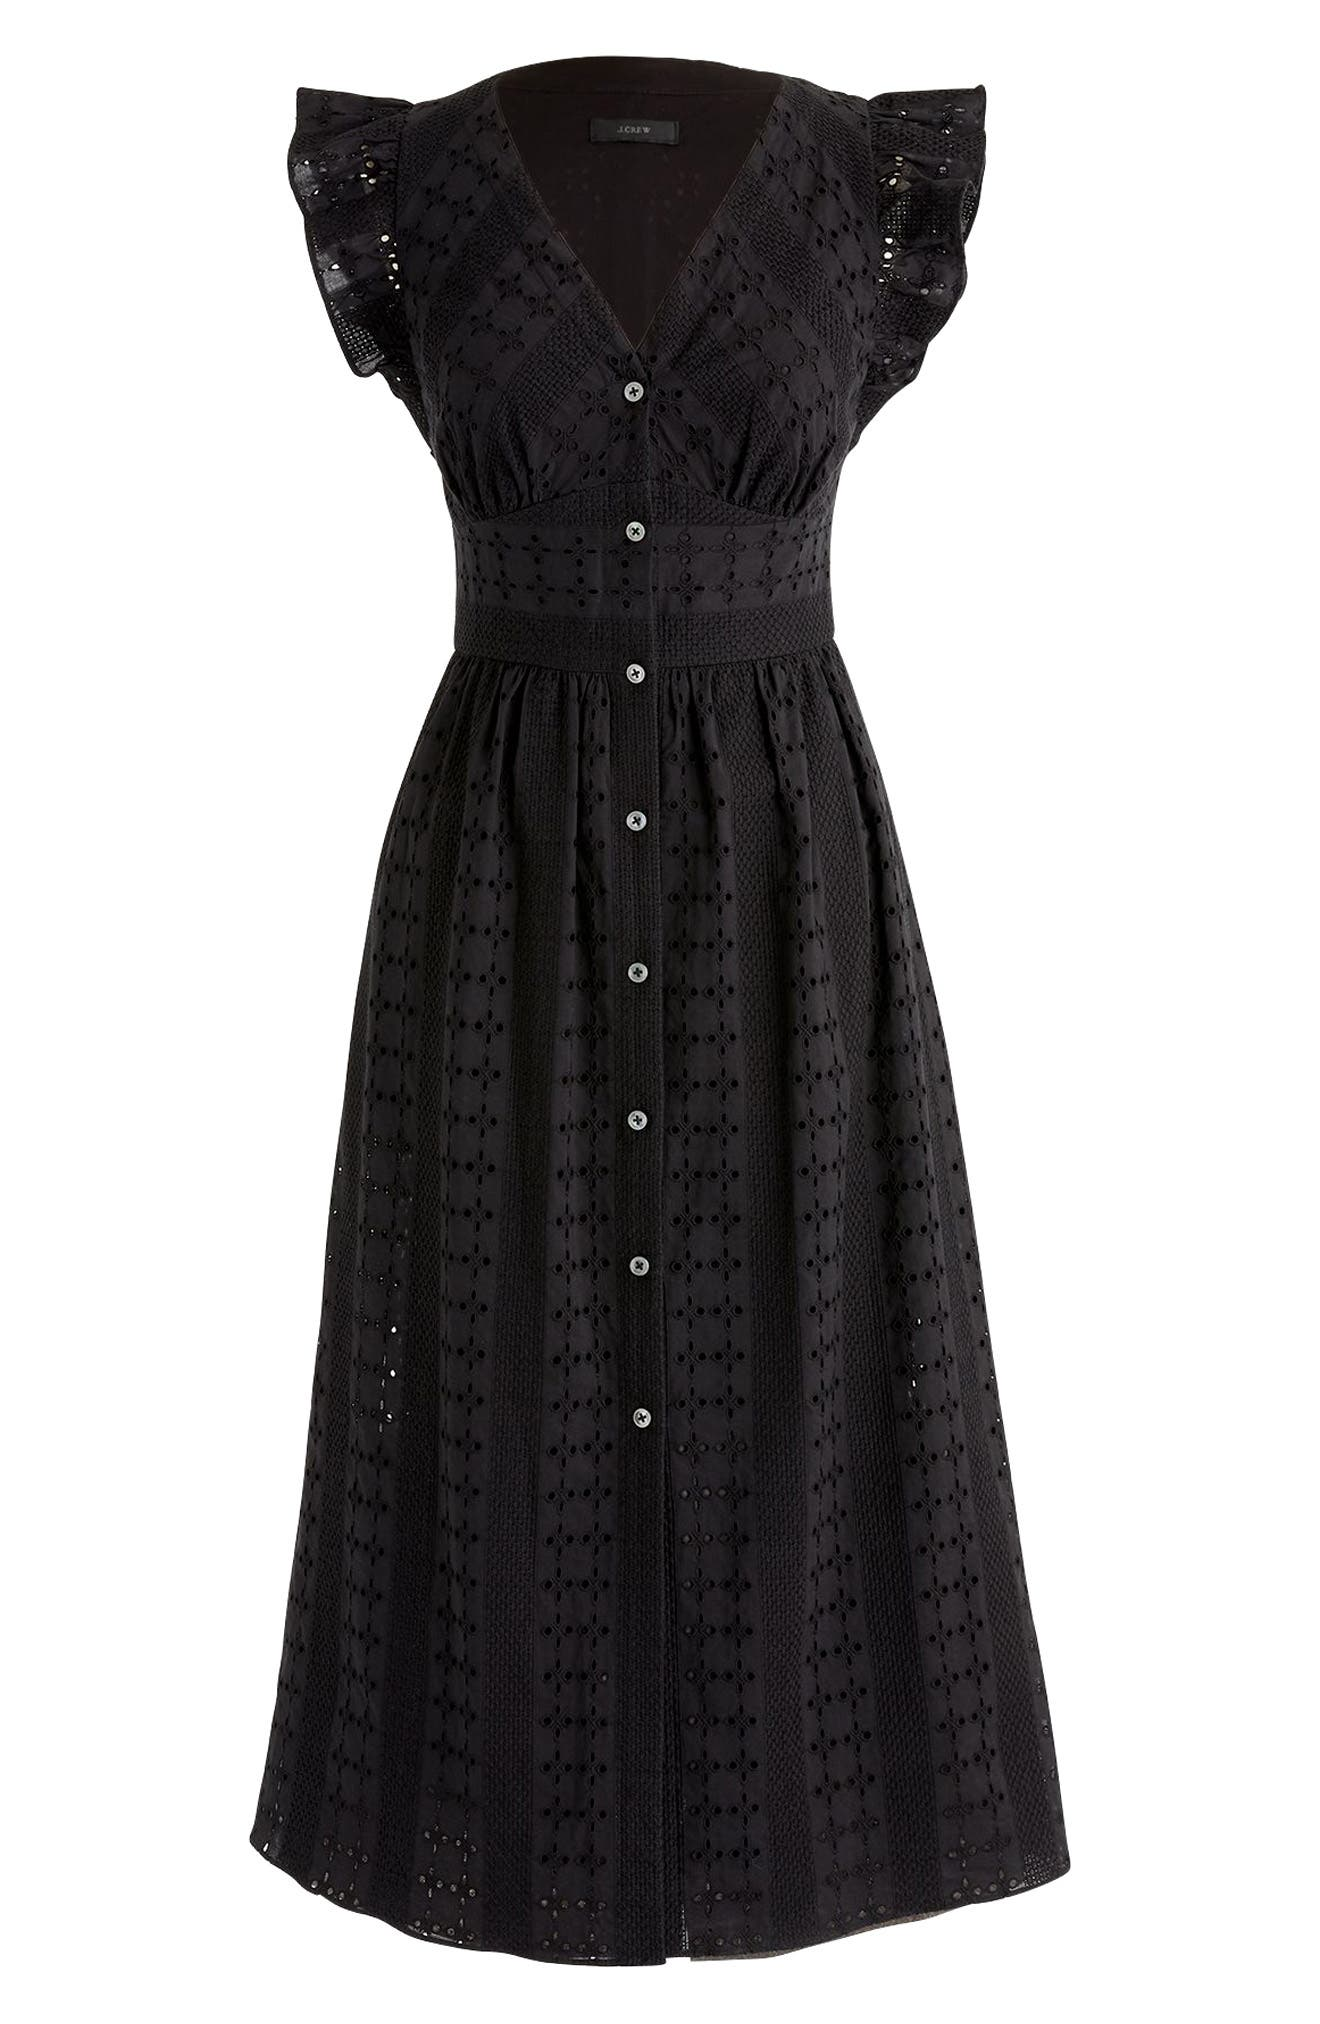 J.Crew Ruffle Sleeve Eyelet Dress,                             Alternate thumbnail 3, color,                             Black